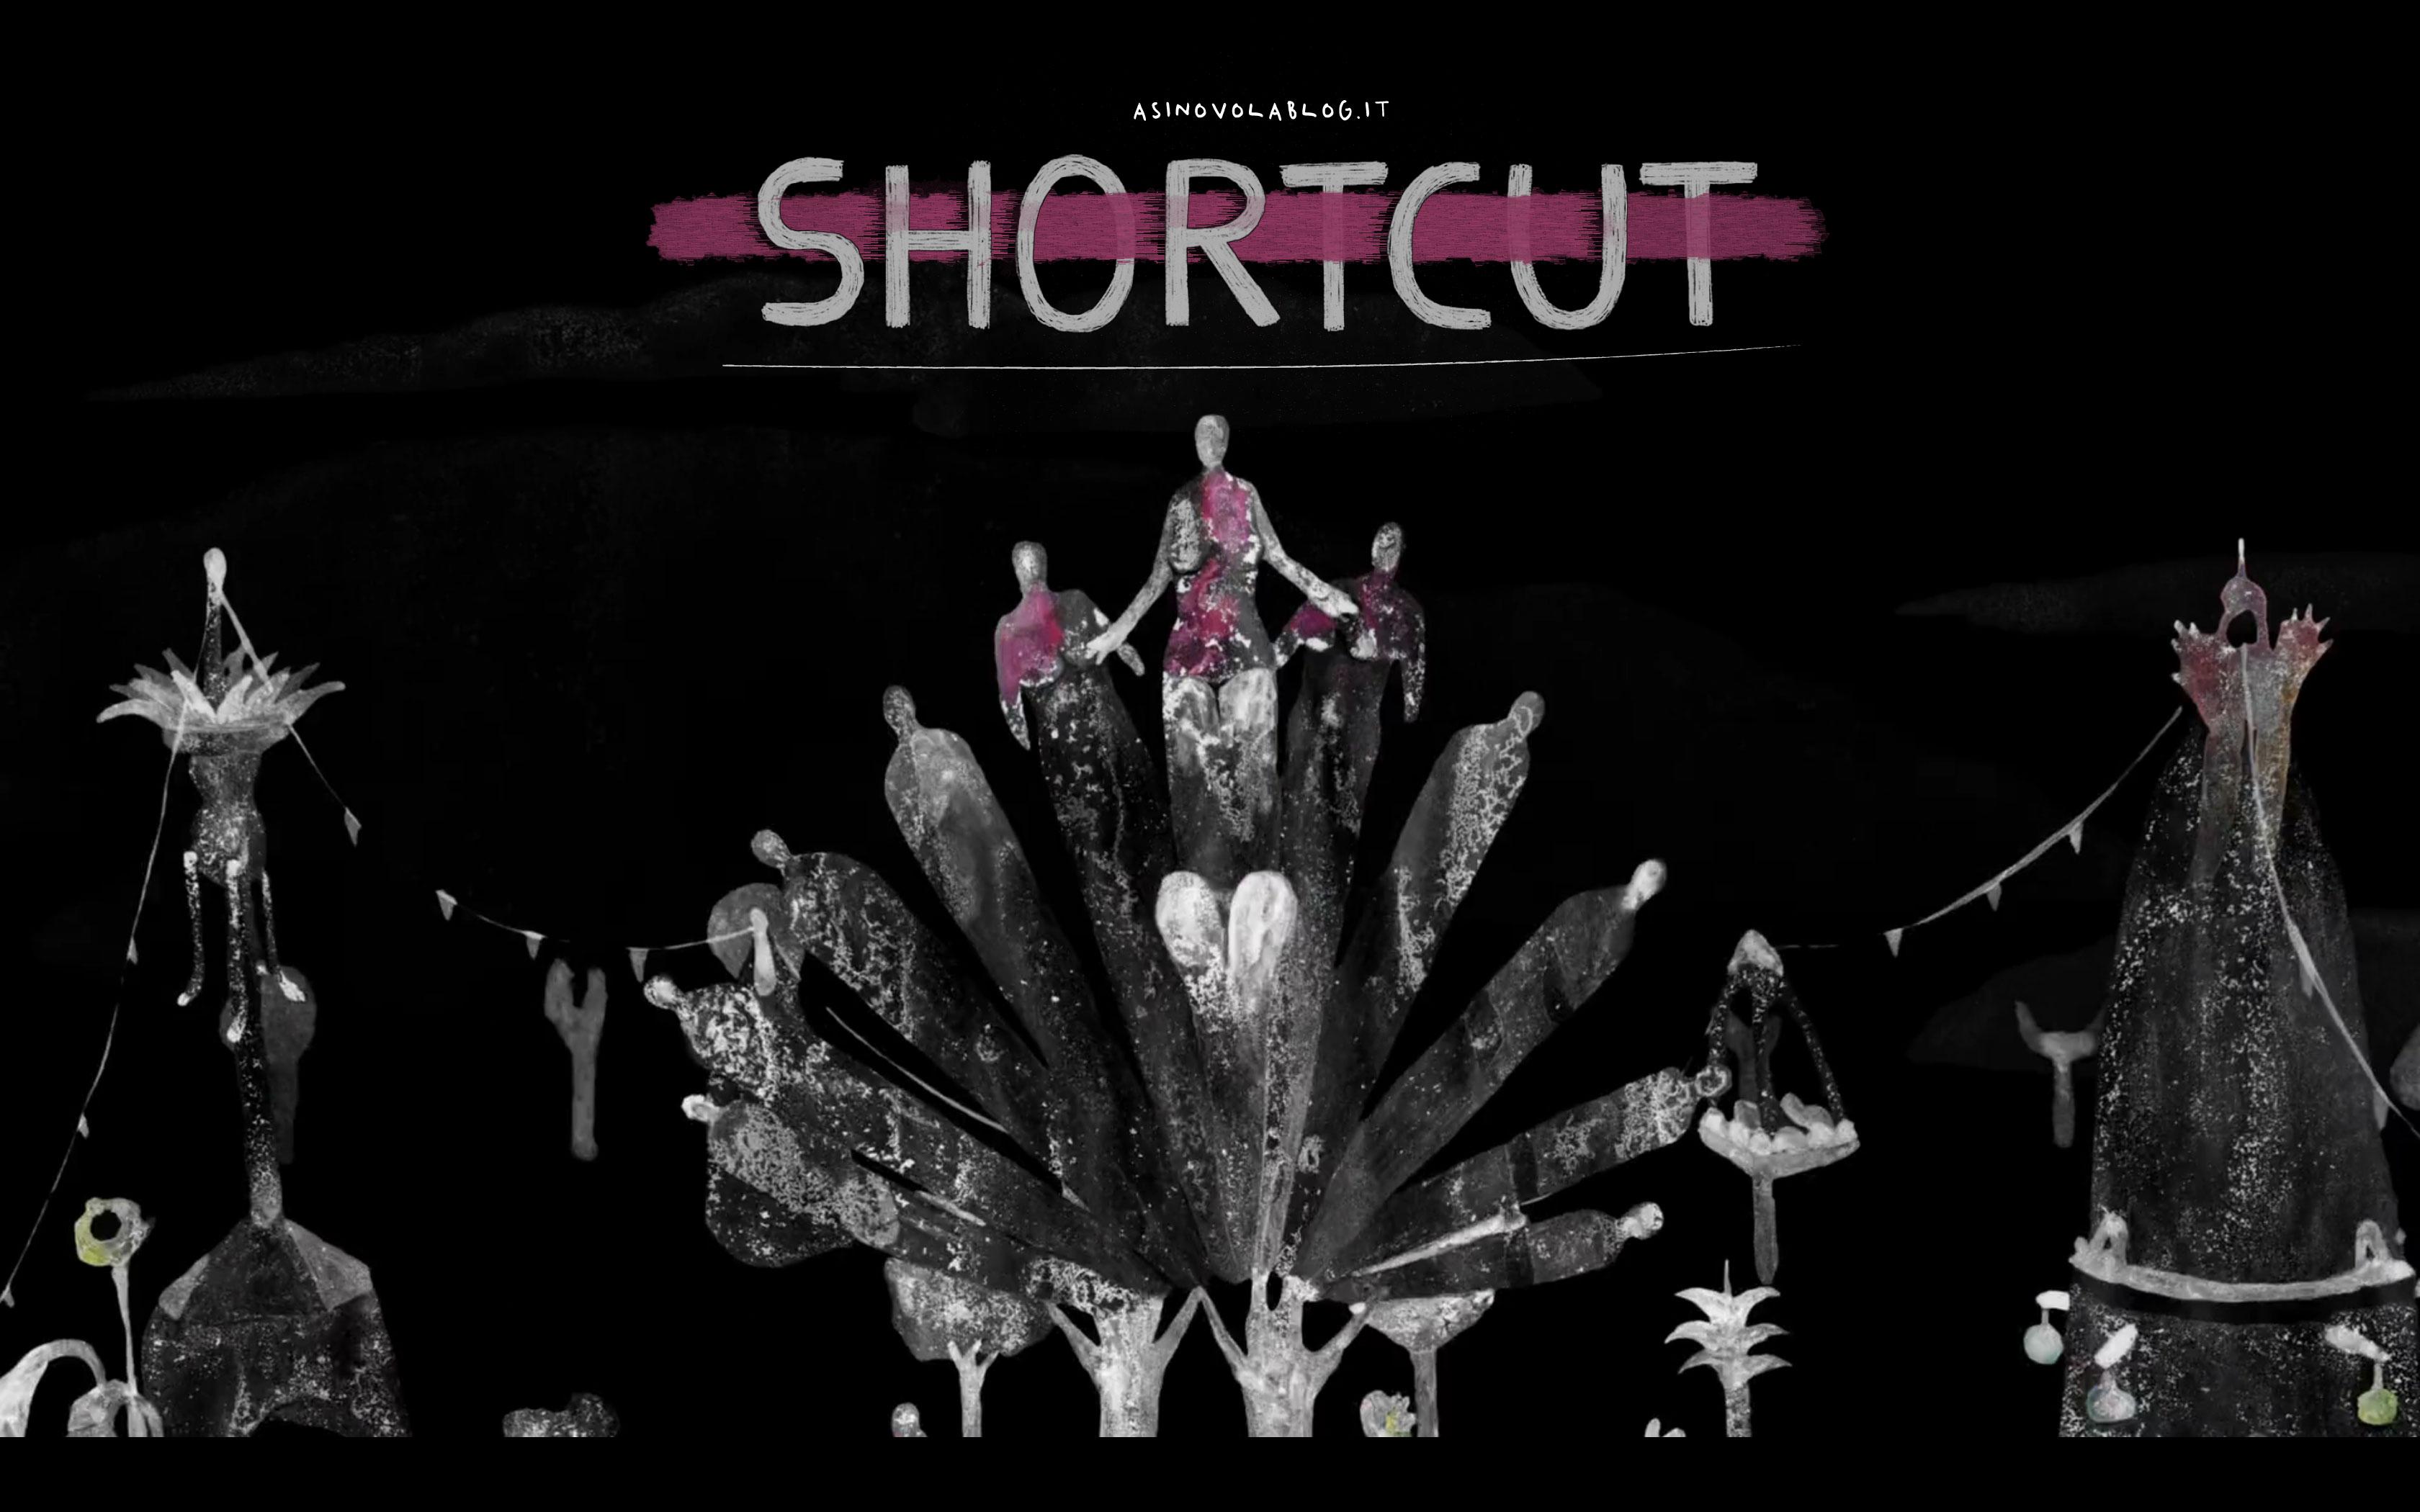 SHORTCUT #2 | Boris Labbé